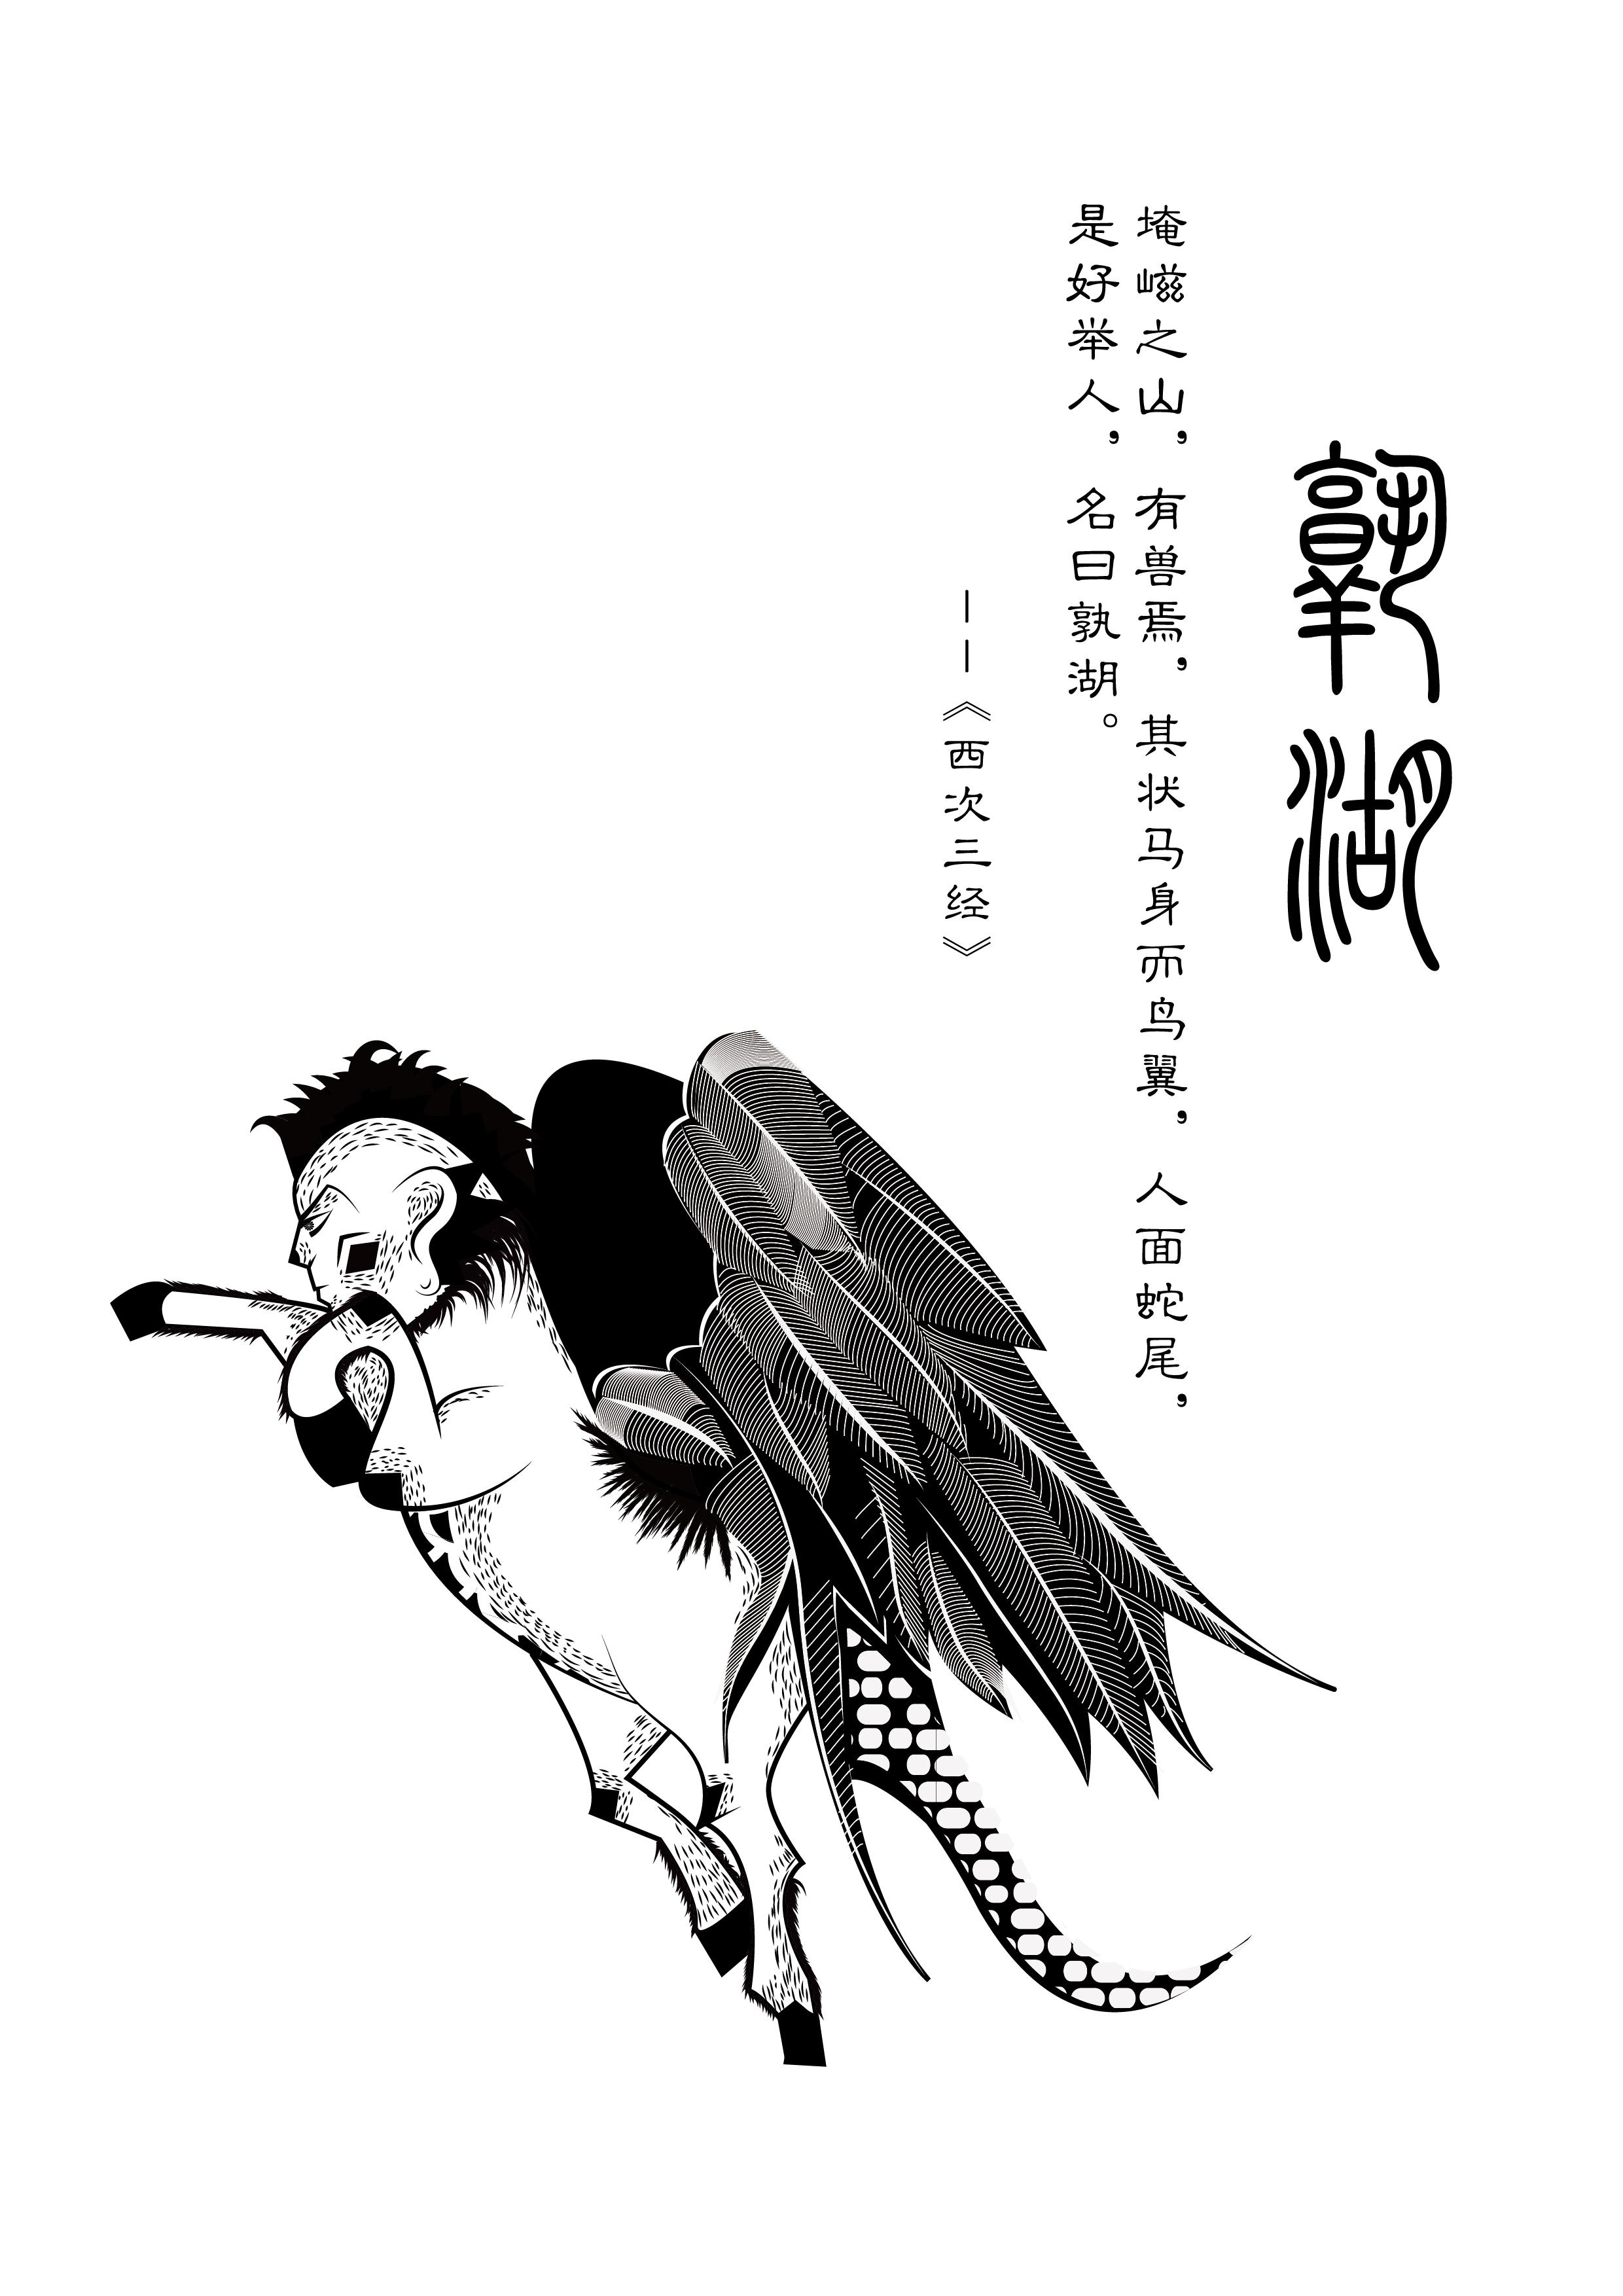 muxusunny_山海经 插画 商业插画 toymuxu - 原创作品 - 站酷